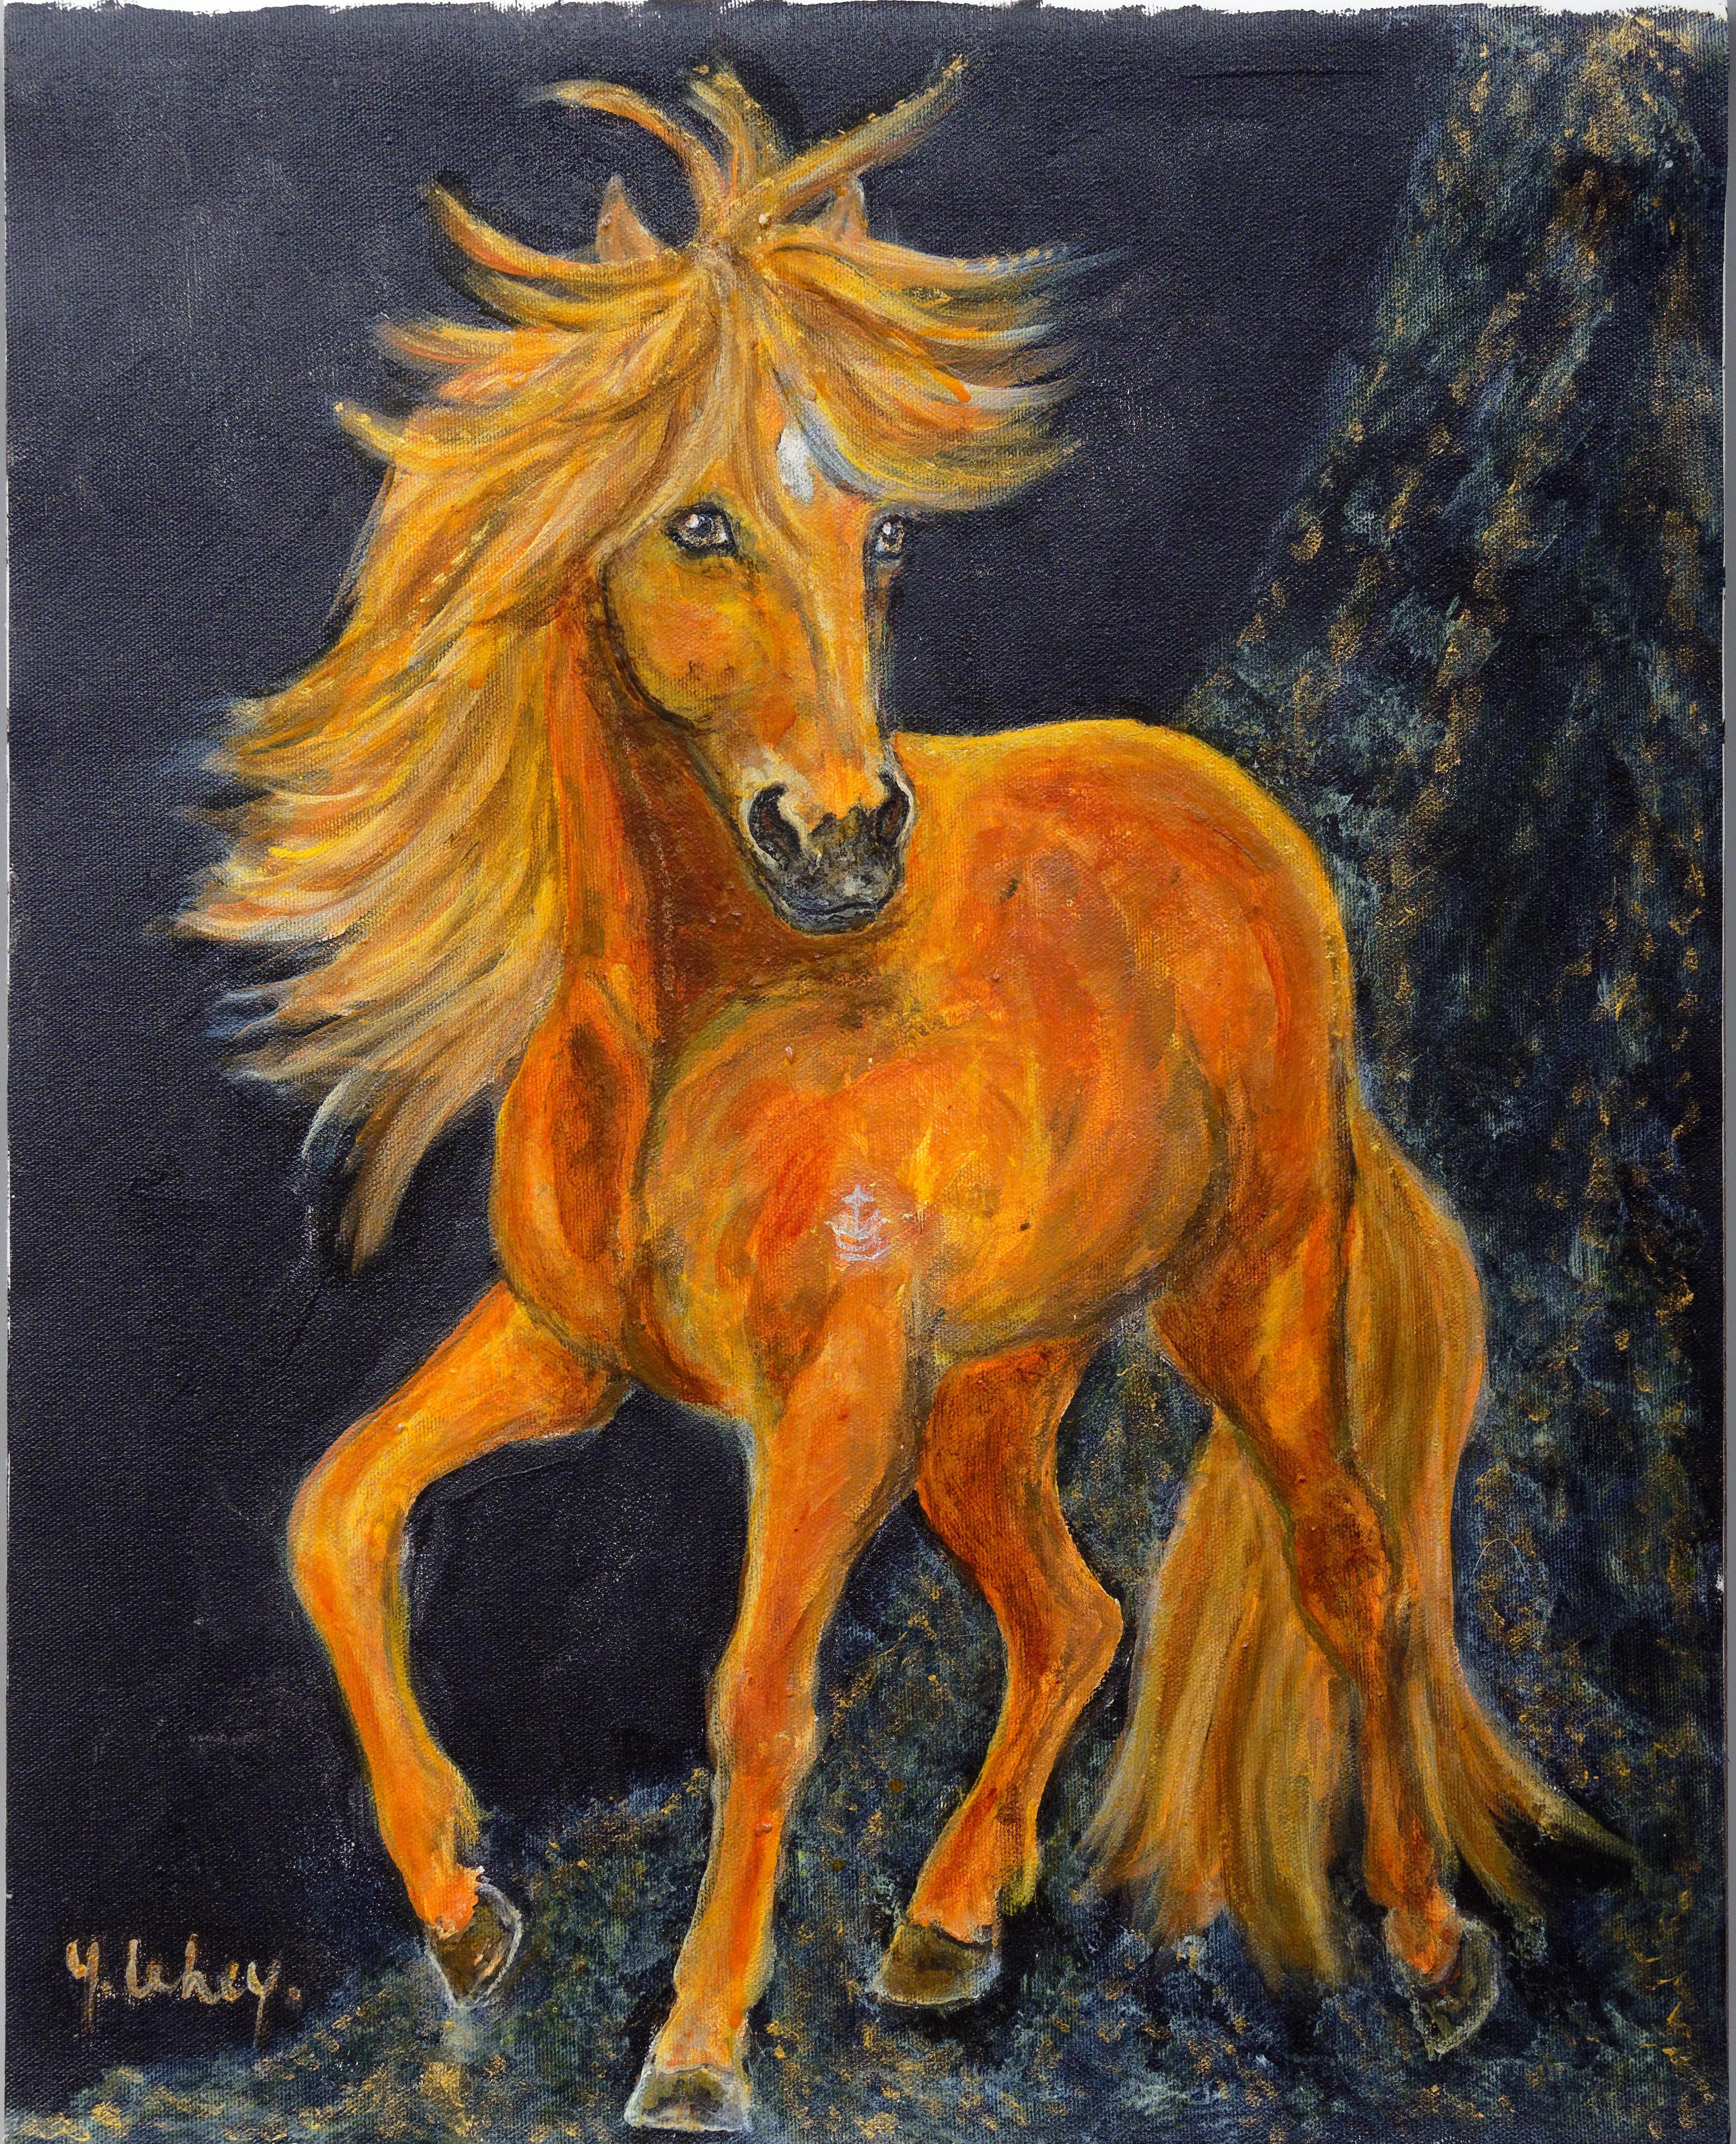 Keldan-painting-1.orig.jpeg